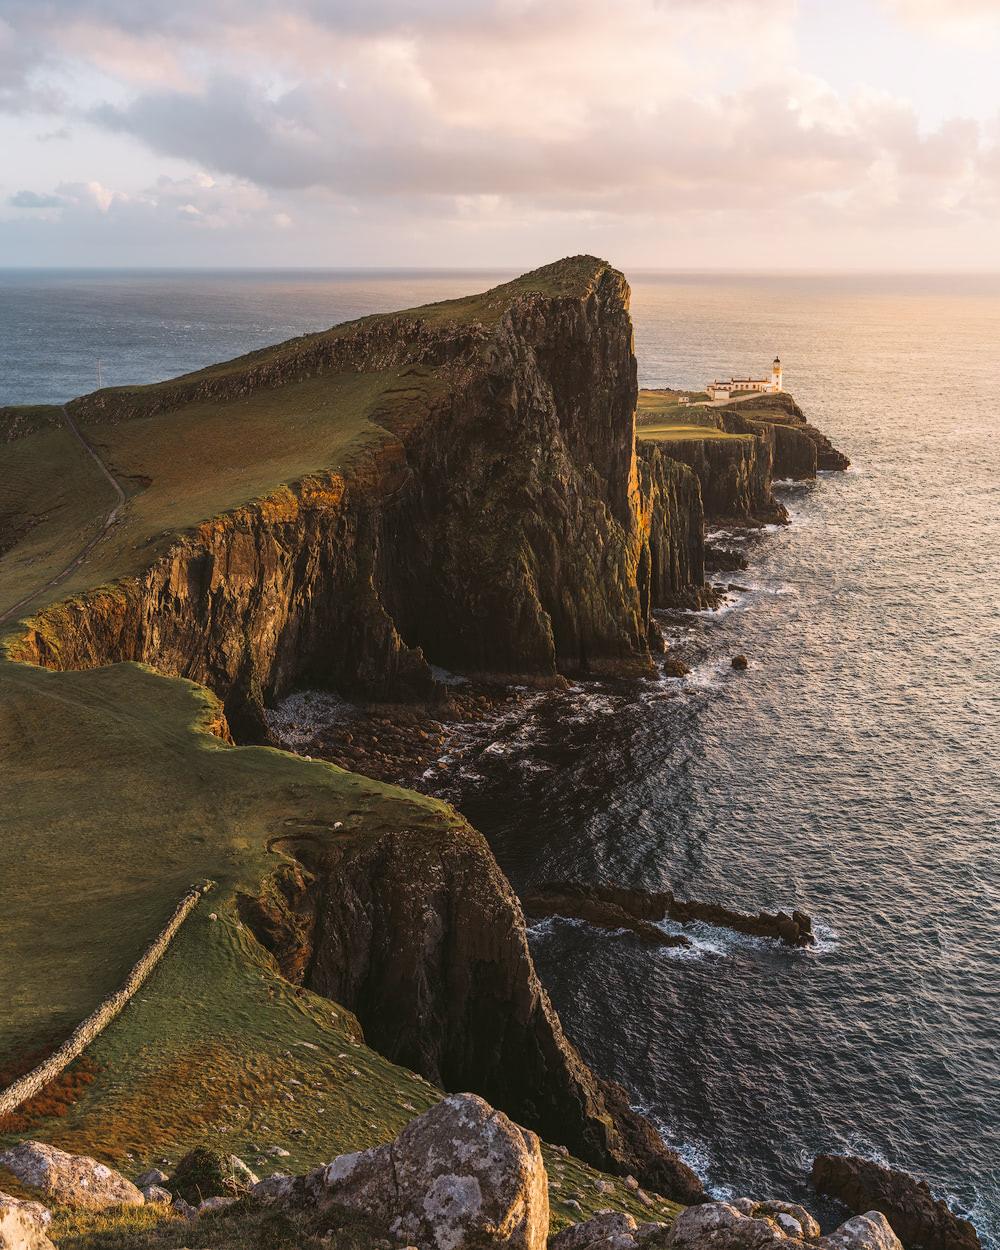 Epic Isle of Skye Photography Locations Renee Roaming Neist Point